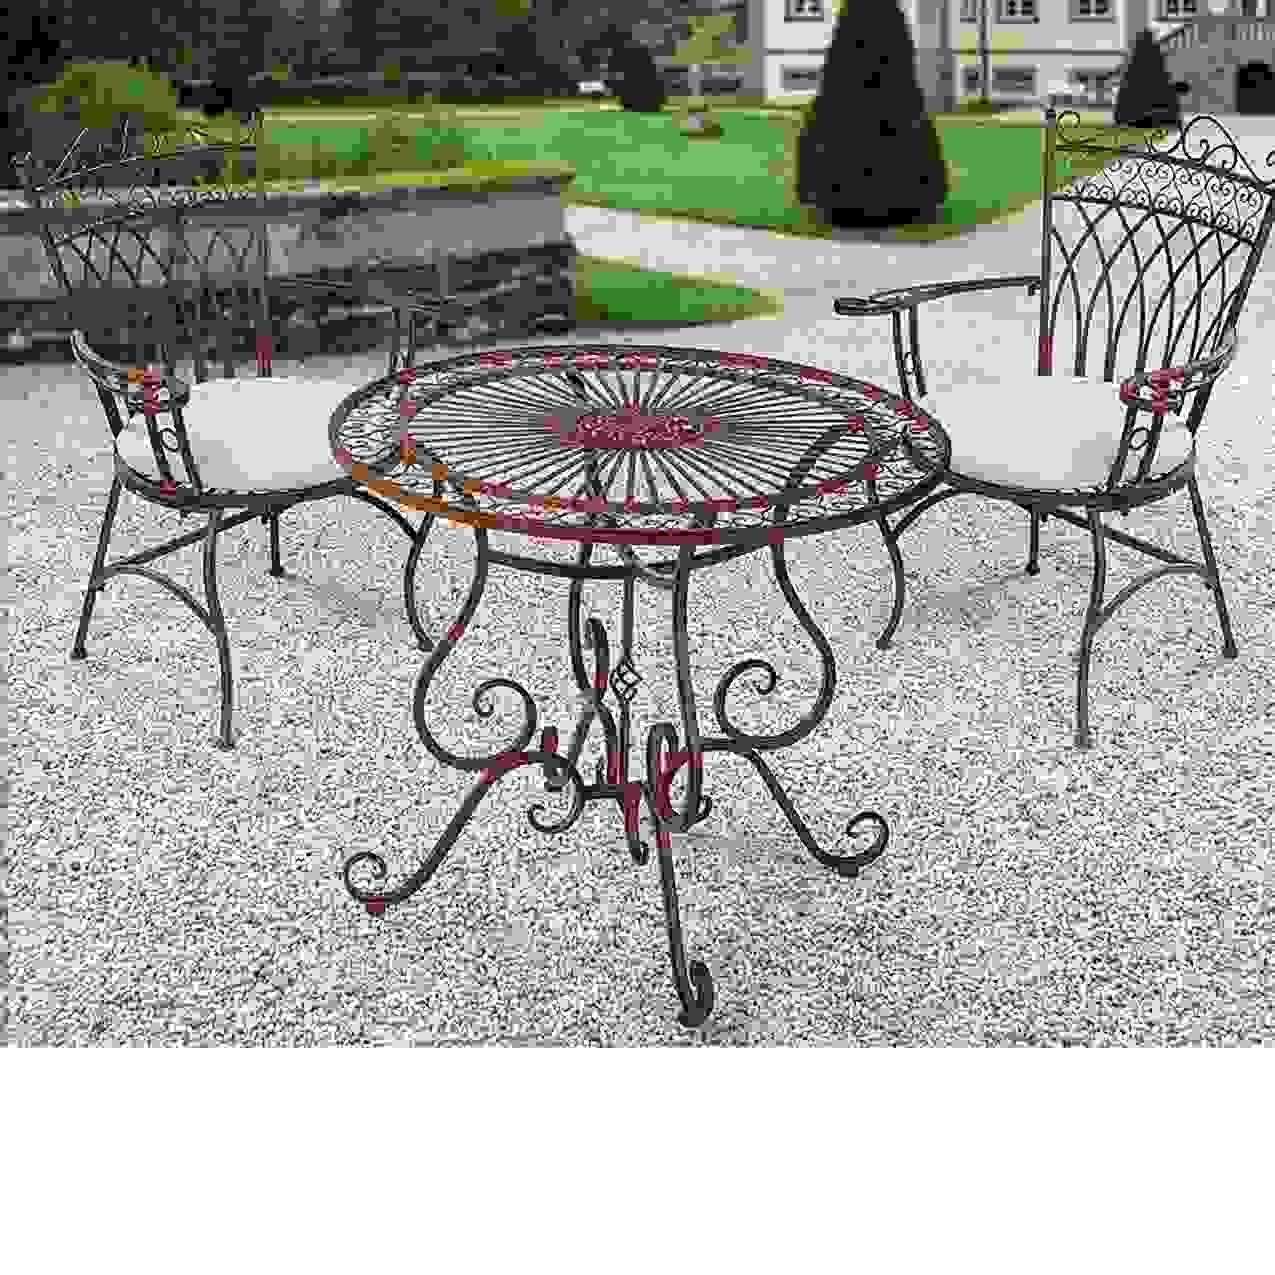 Gartenmöbel Set Aus Metall Antik Braun 3 Teilig Kaufen Konzept Von von Gartenmöbel Aus Metall Antik Photo